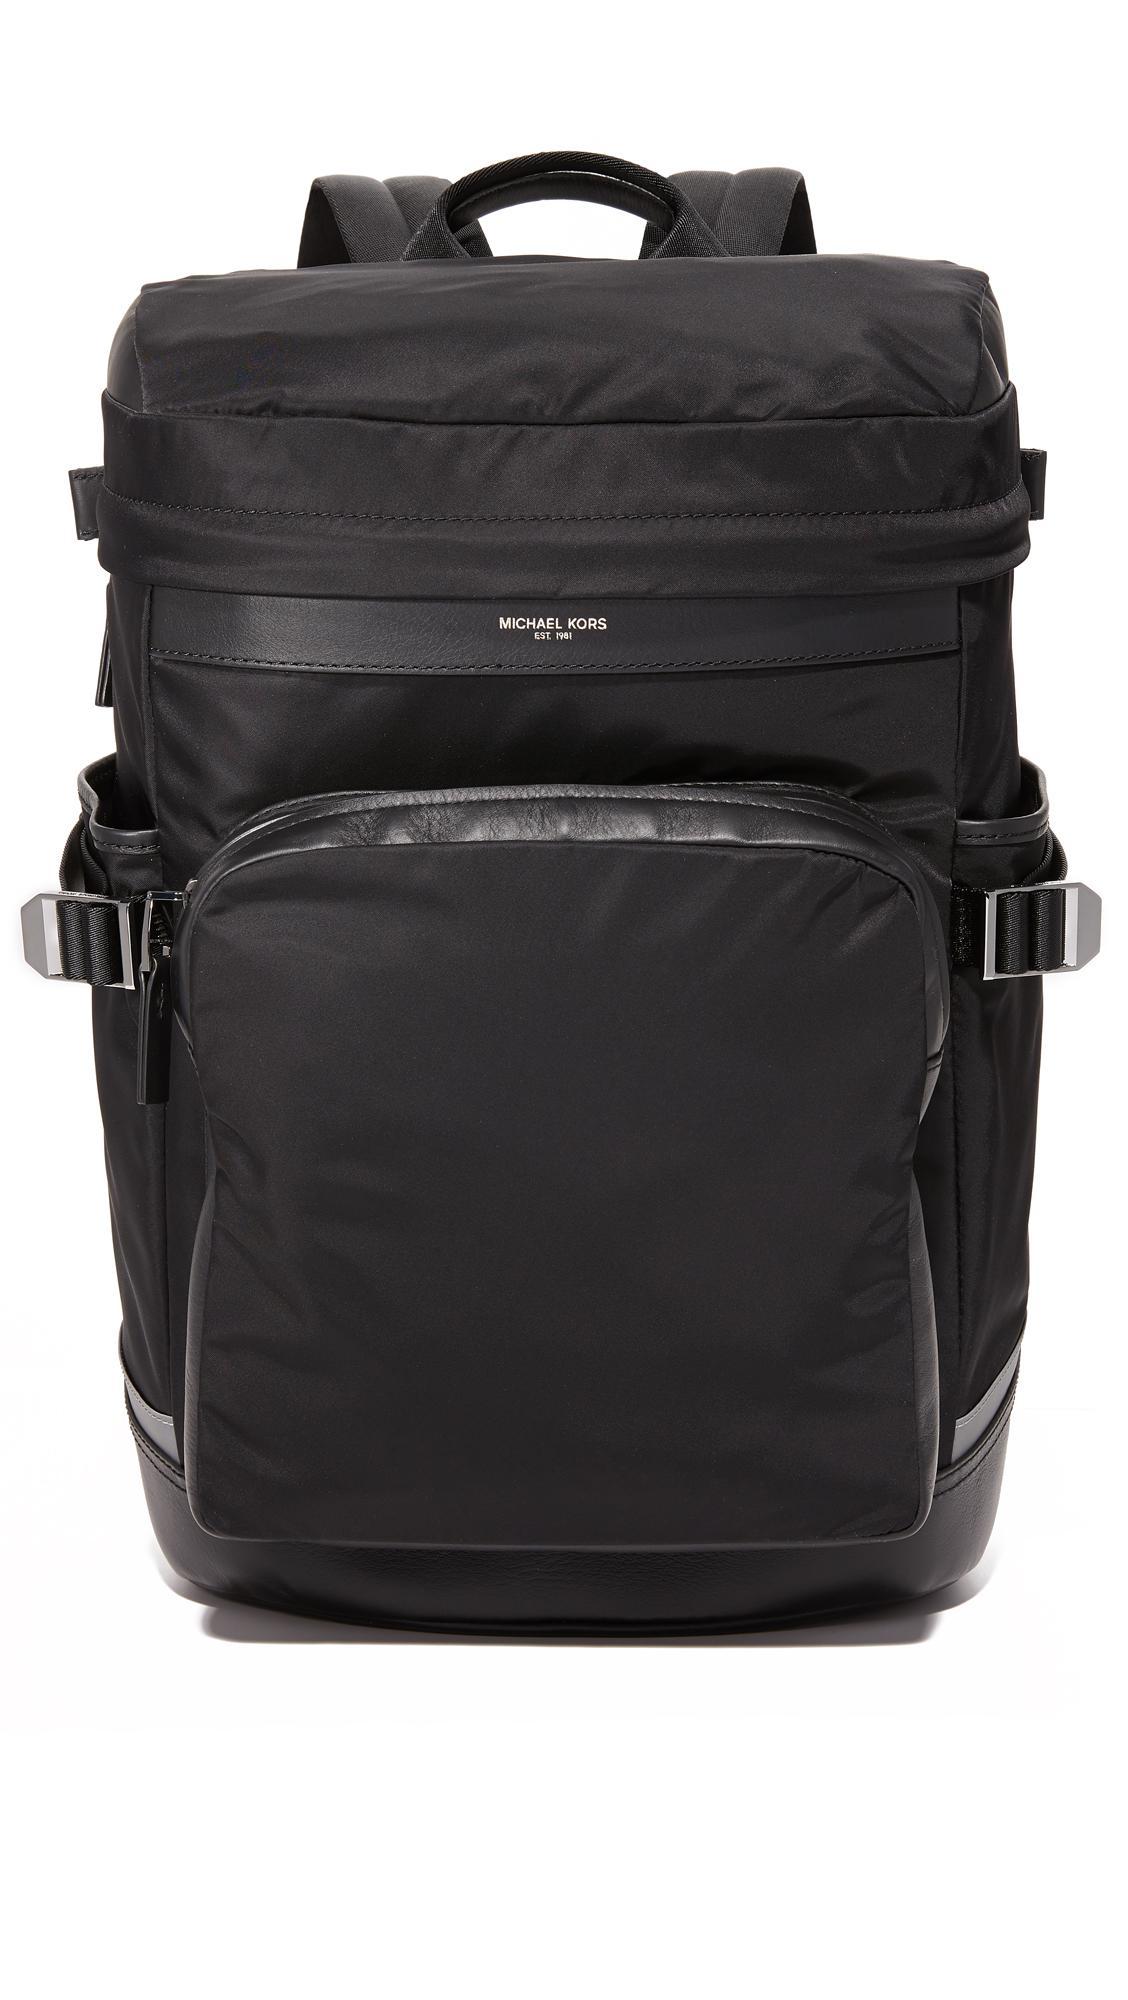 500d730f617b Lyst - Michael Kors Kent Nylon Cycling Backpack in Black for Men